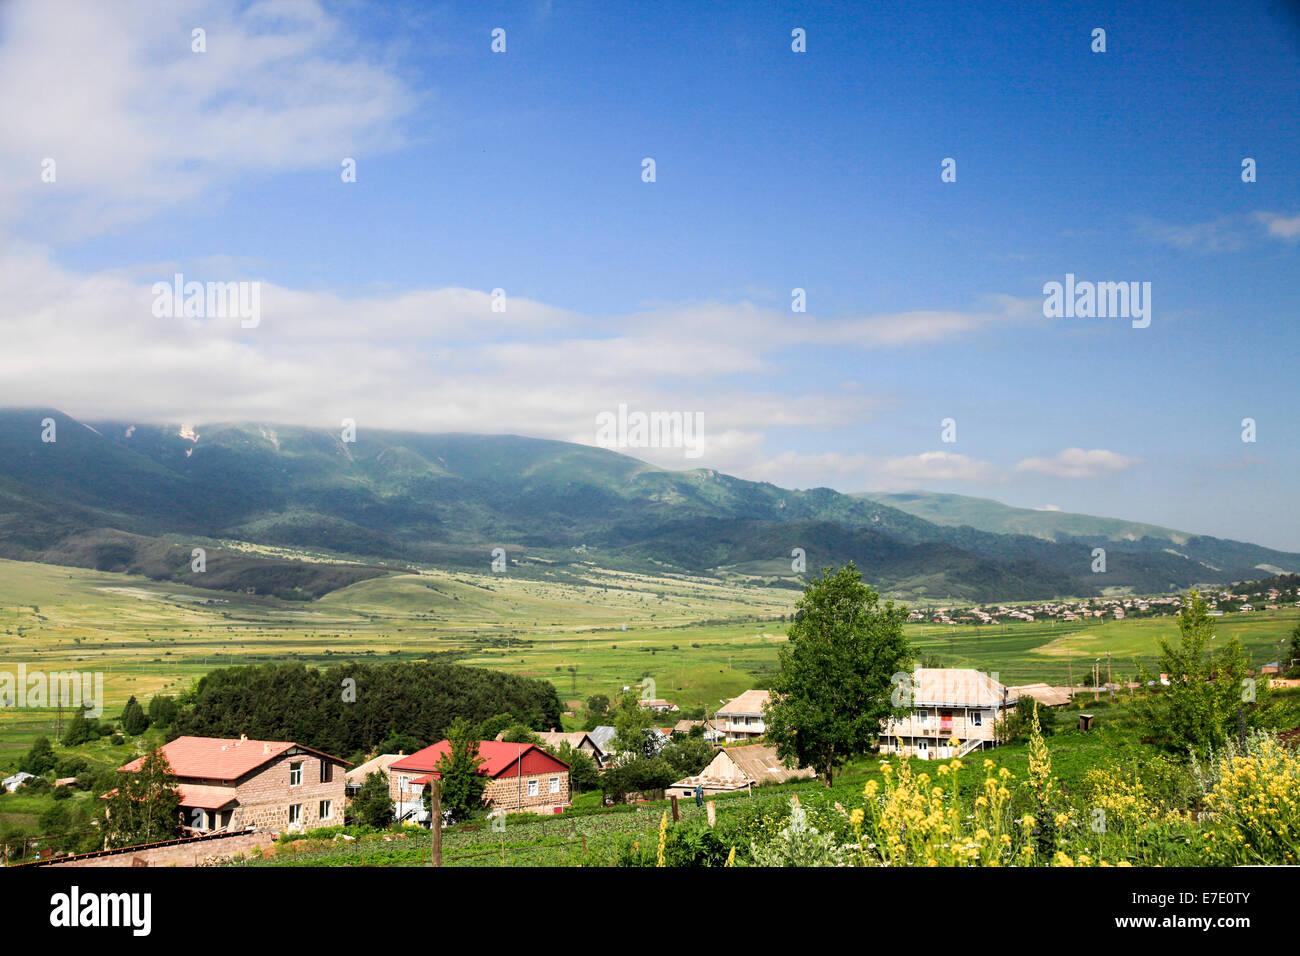 Armenian farmland - Stock Image